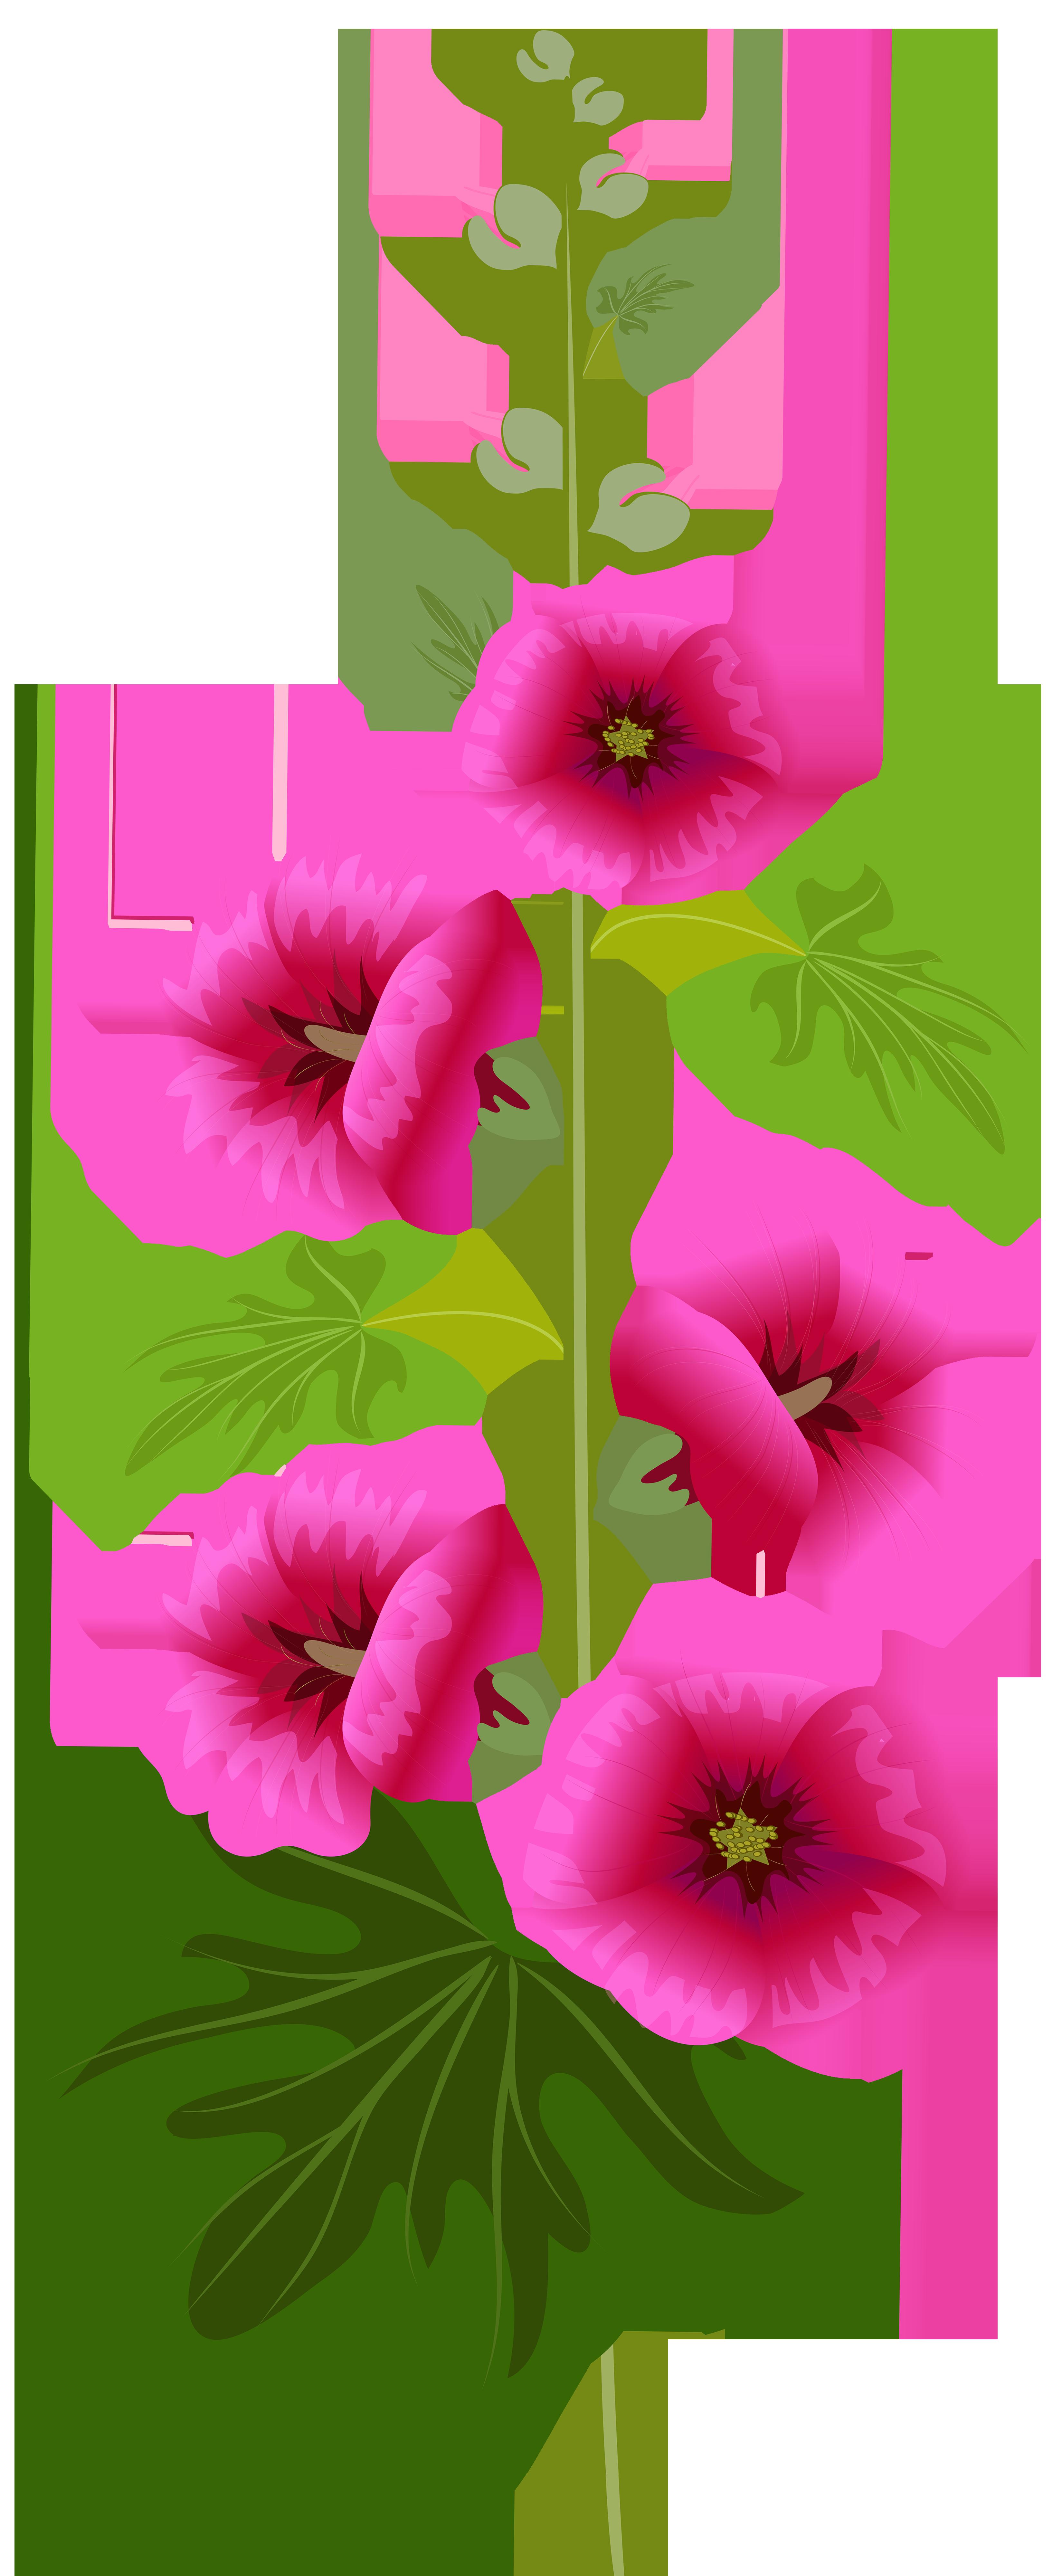 3298x8000 Purple Flower Clip Art Imageu200b Gallery Yopriceville